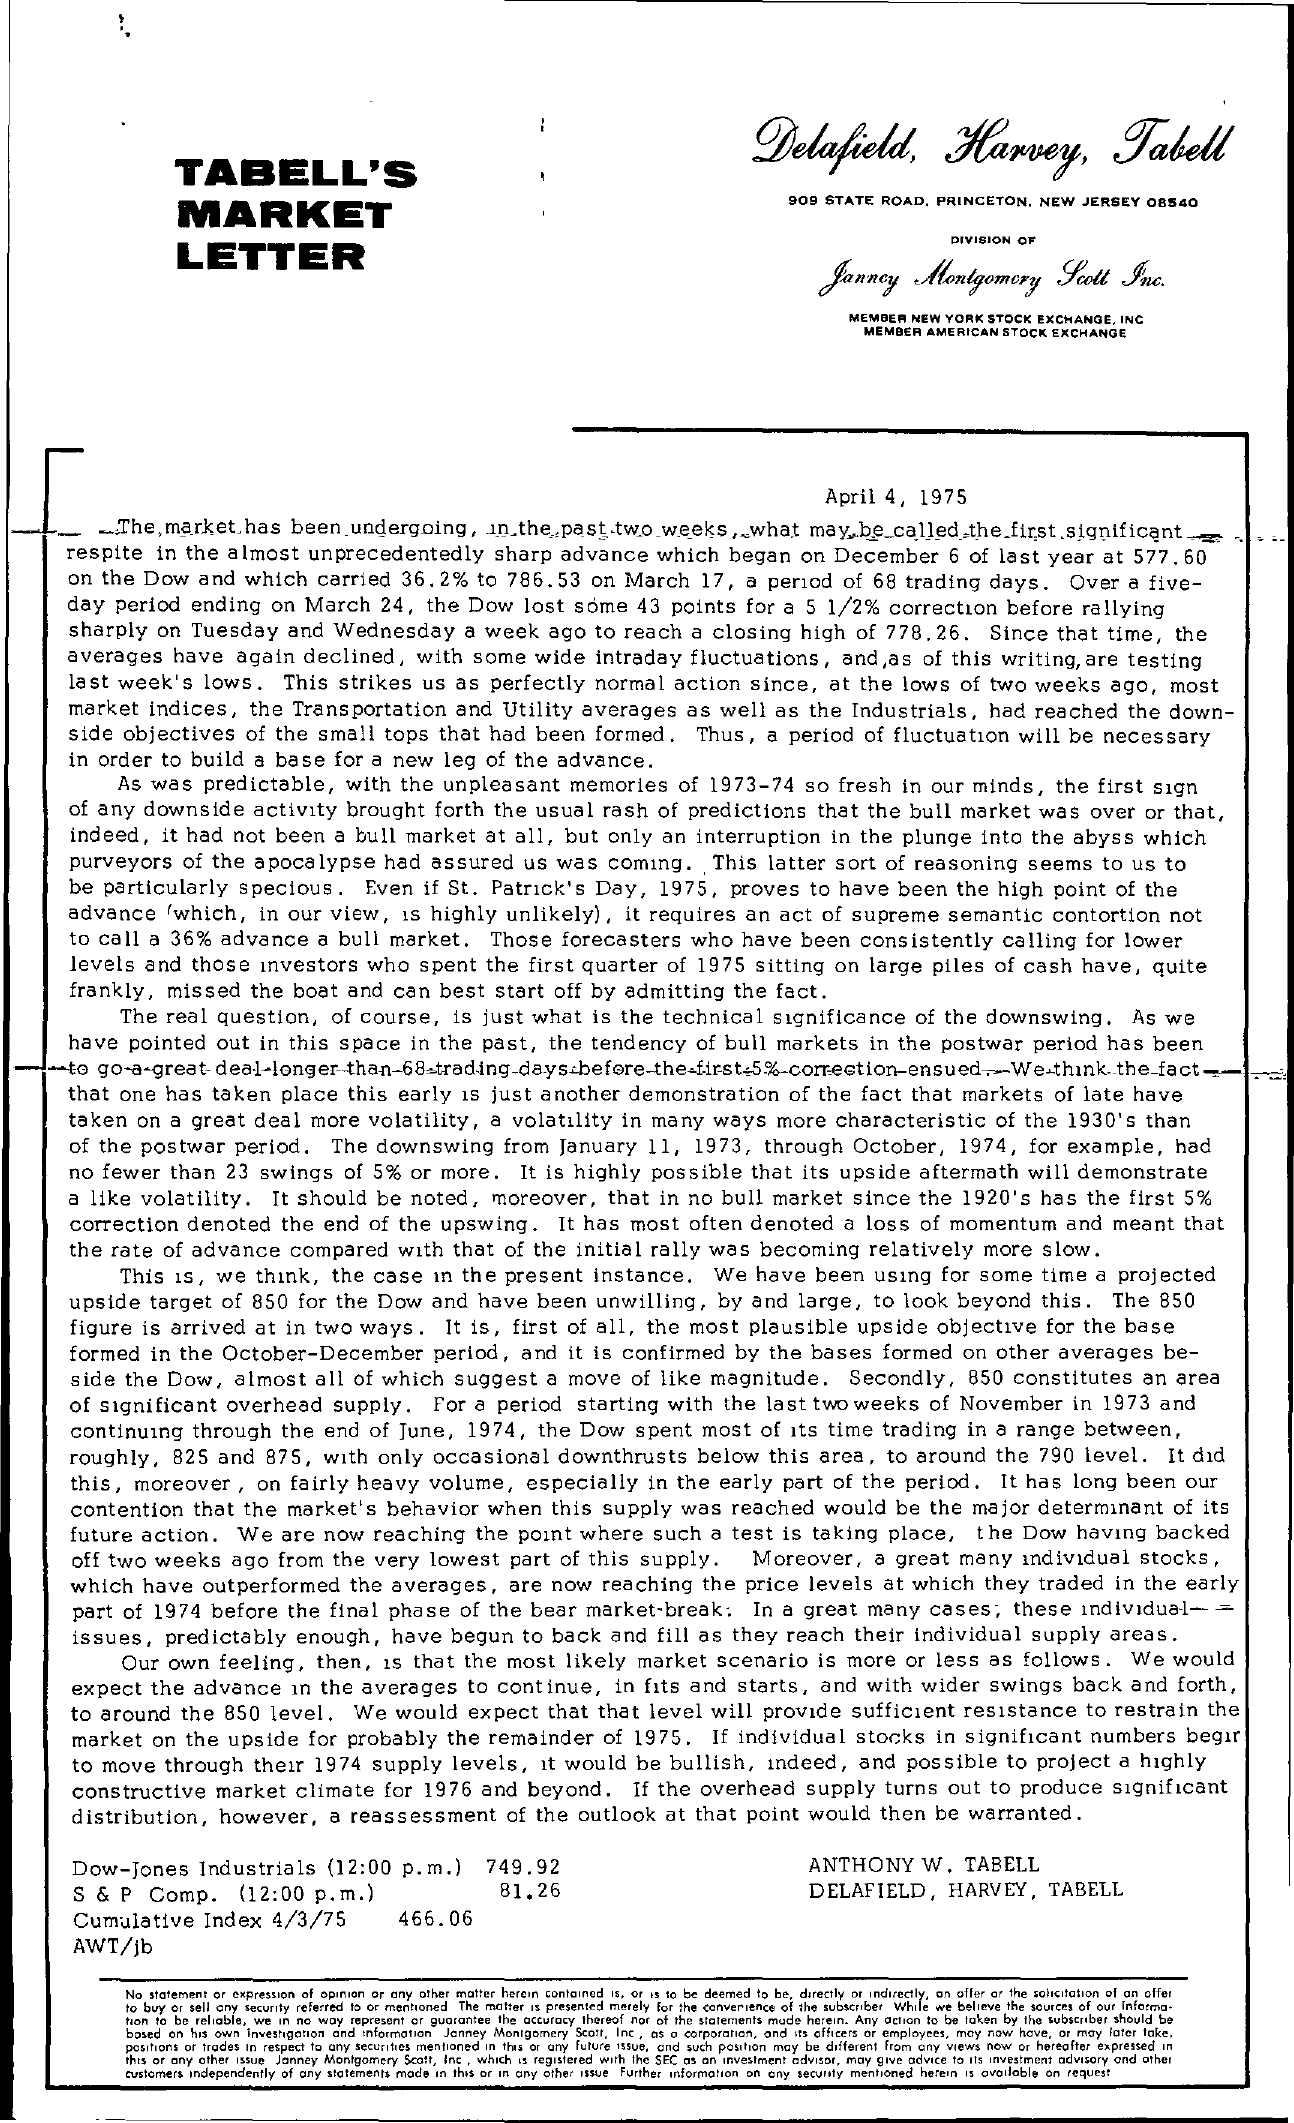 Tabell's Market Letter - April 04, 1975